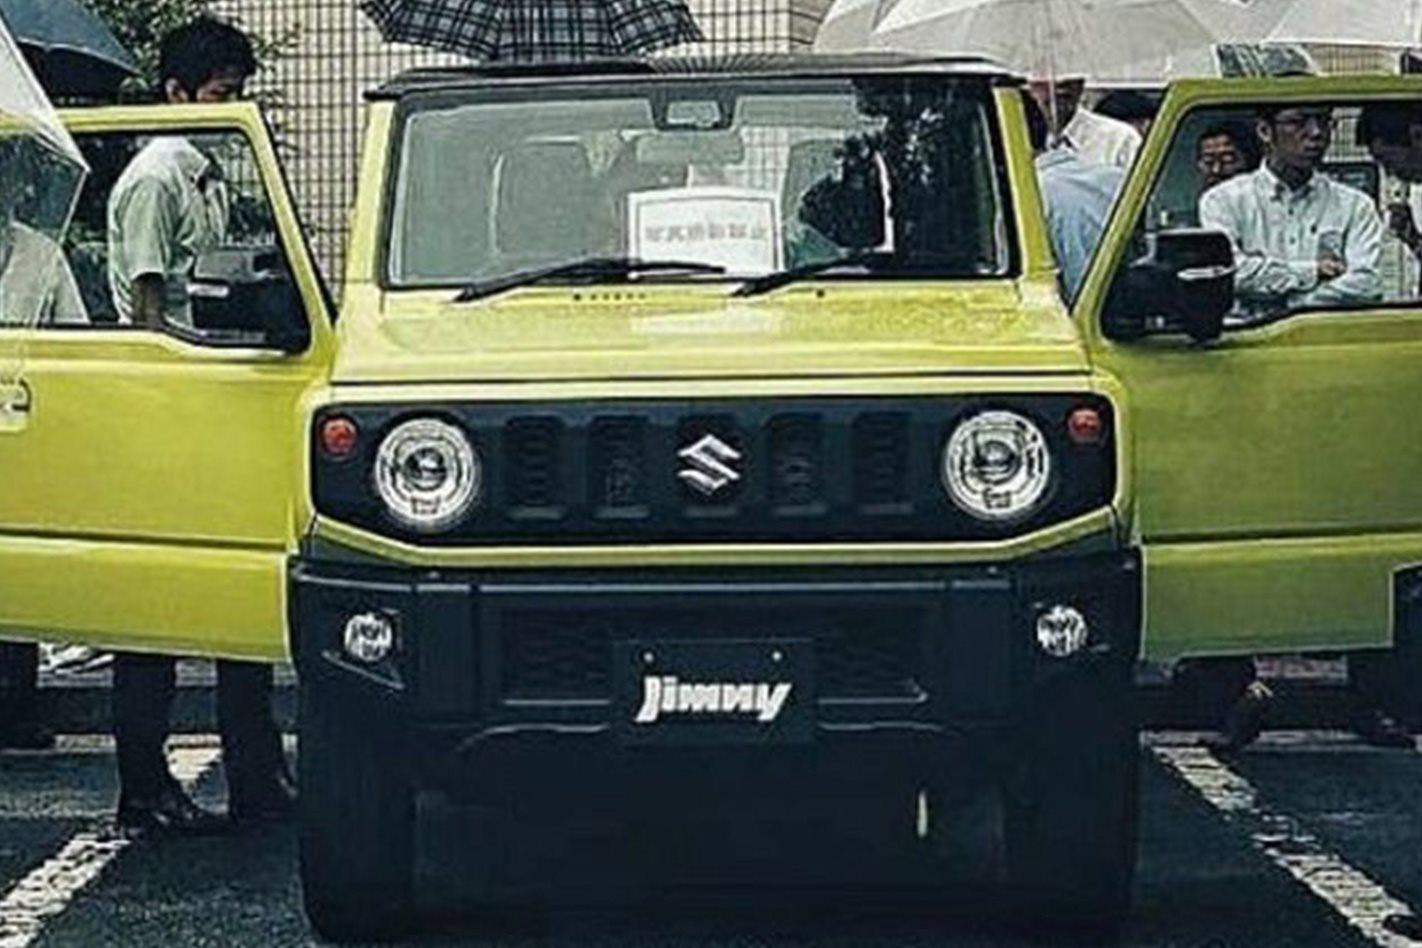 2019 Suzuki Jimny Photos Surface